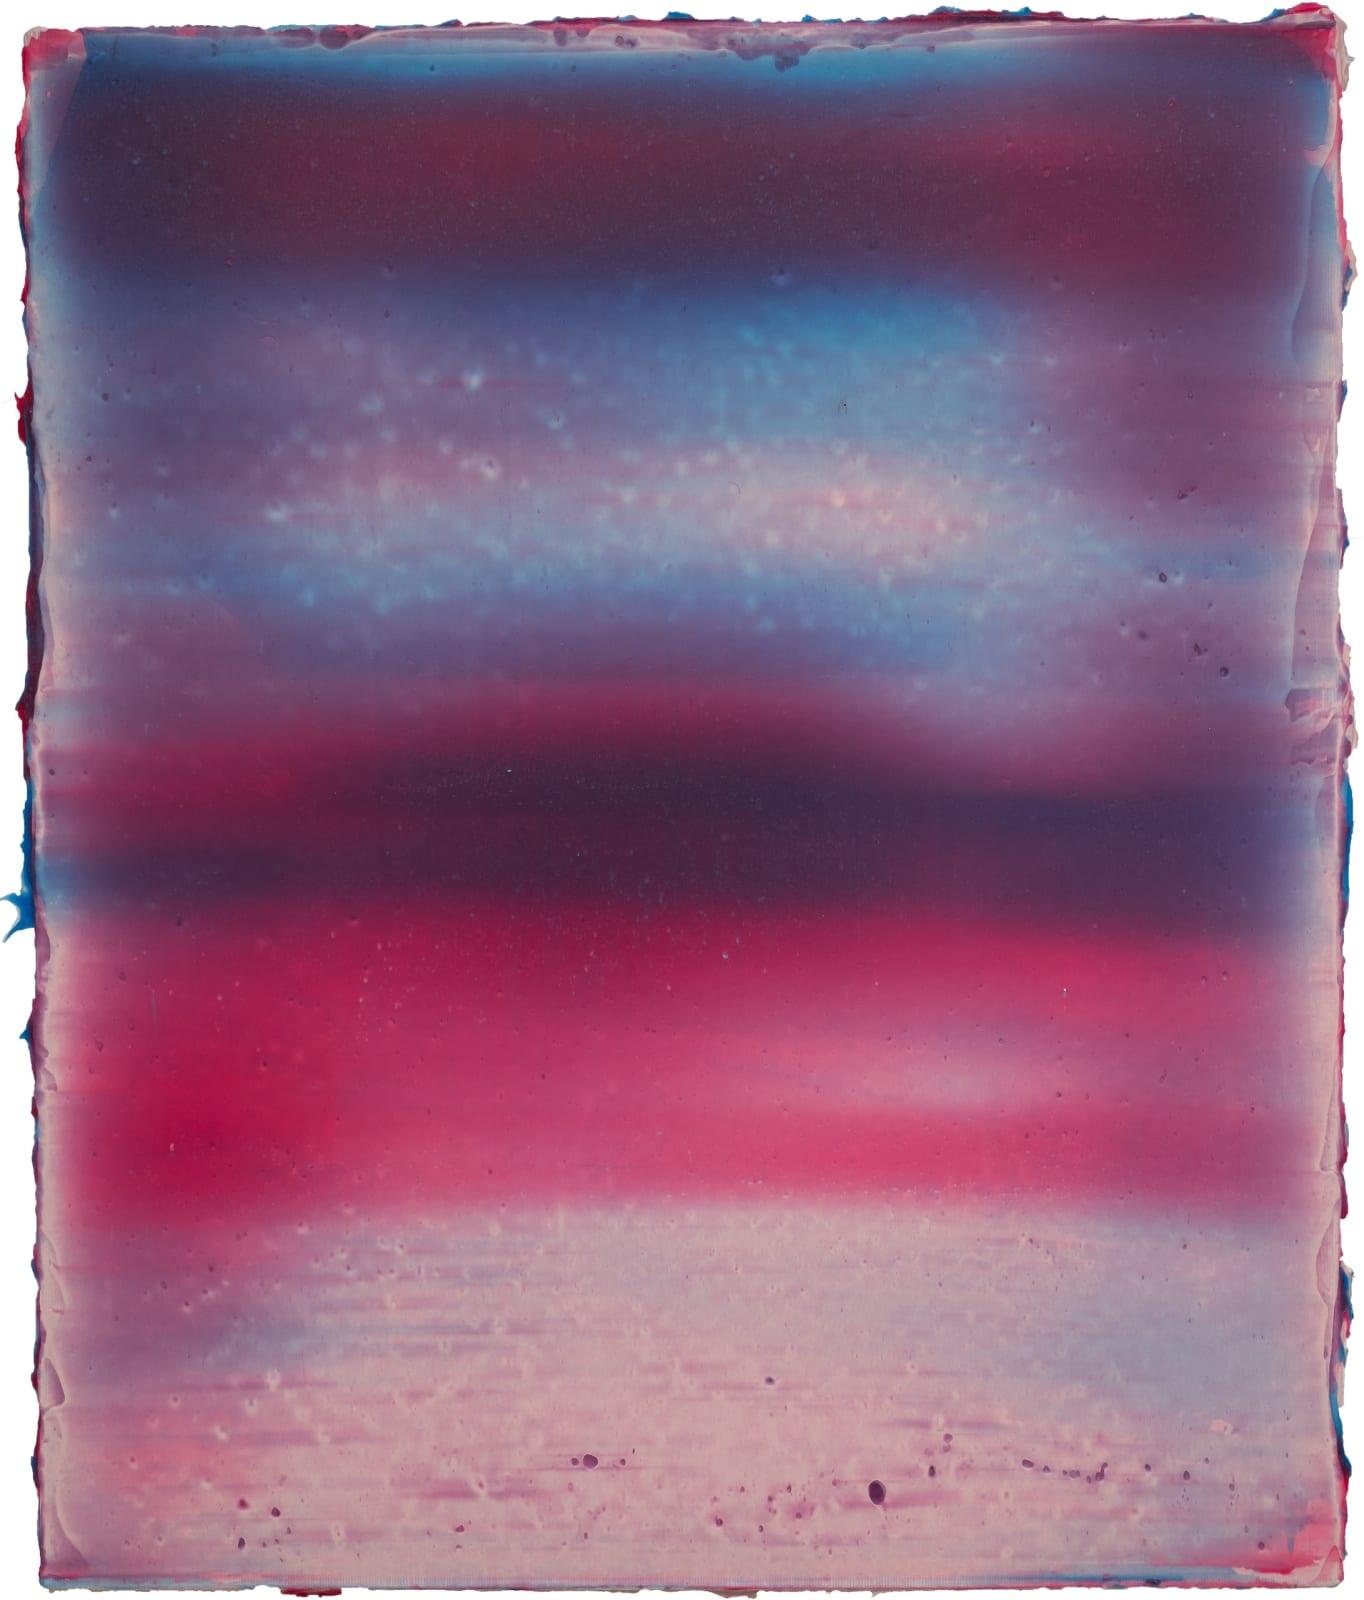 Nejat Sati, Rainbow 2, 2016